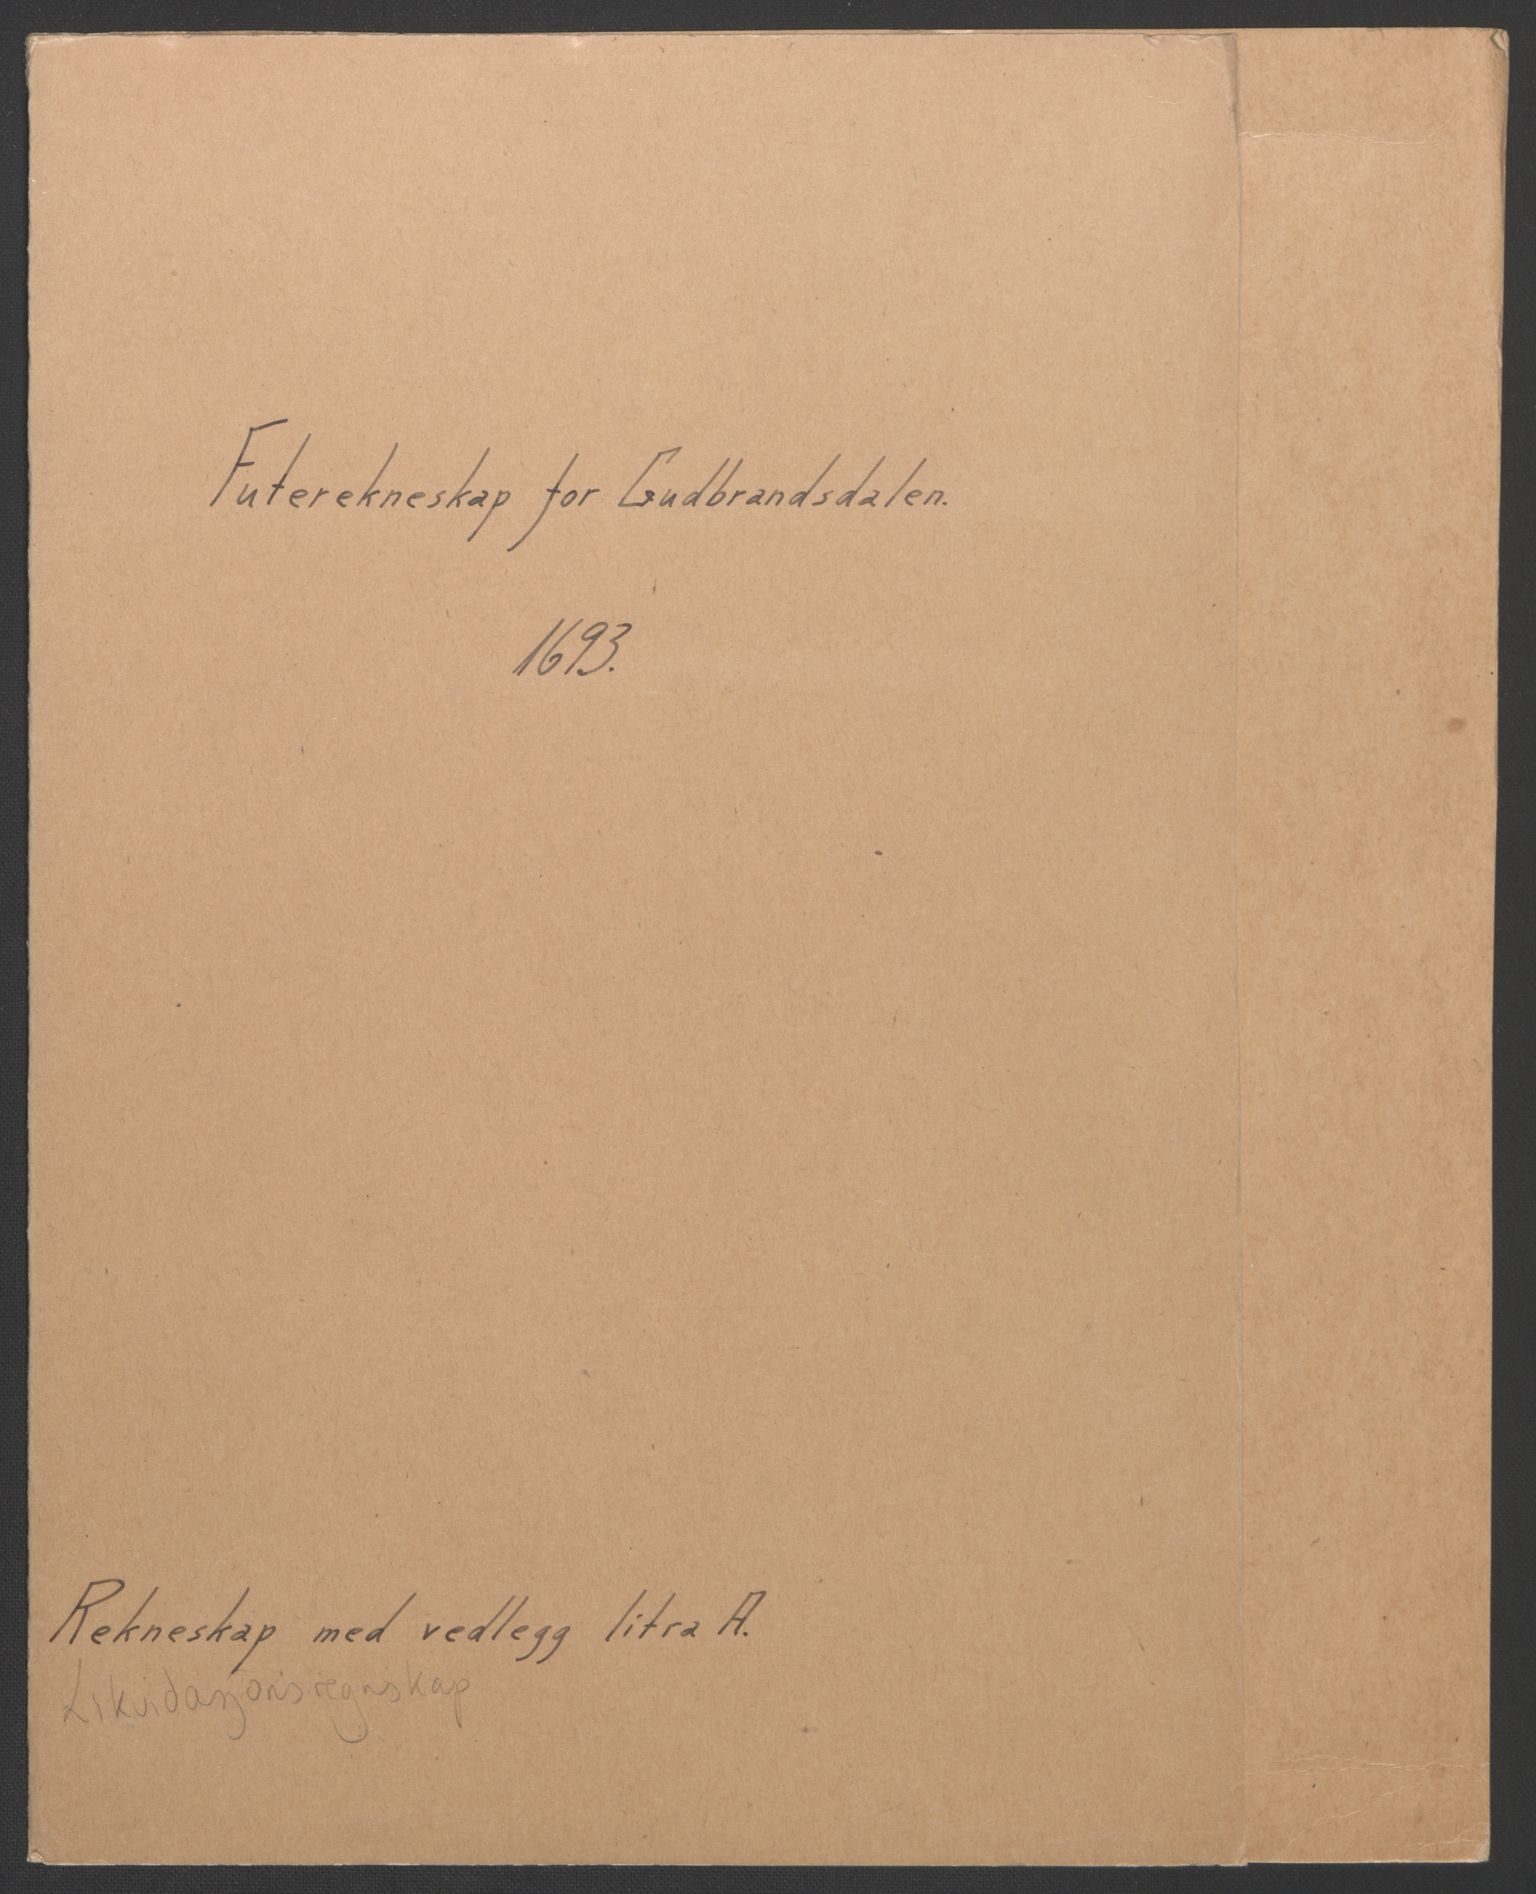 RA, Rentekammeret inntil 1814, Reviderte regnskaper, Fogderegnskap, R17/L1167: Fogderegnskap Gudbrandsdal, 1693, s. 2